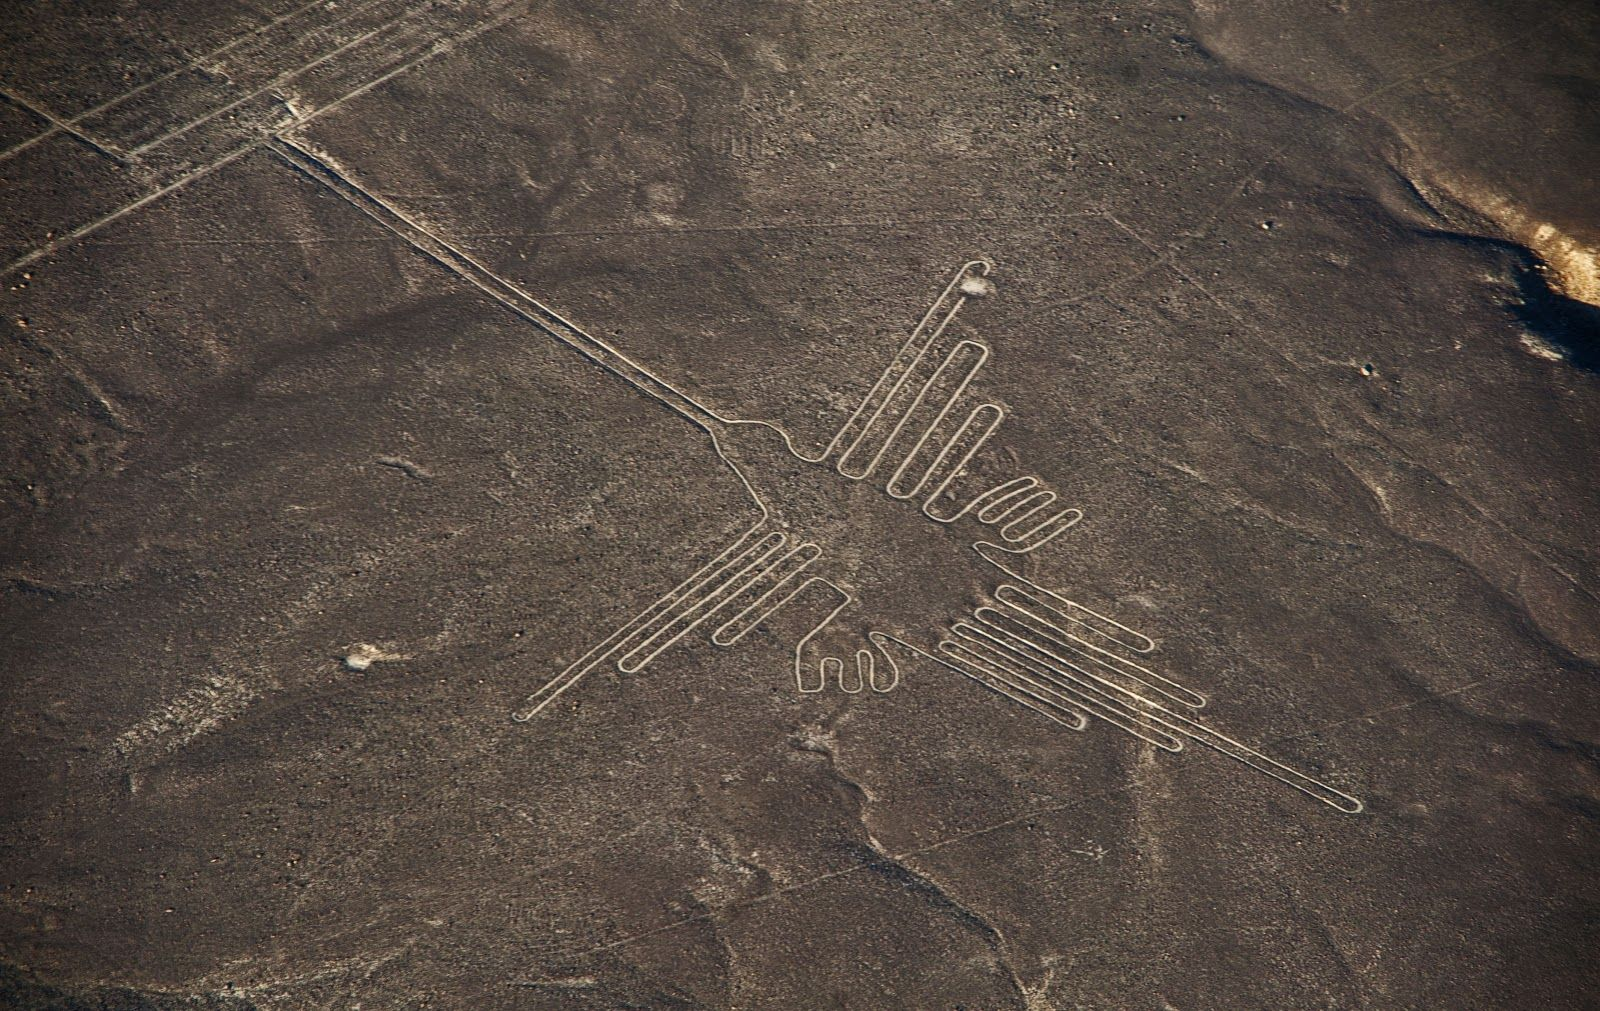 Colibri  - Nazca line of the hummingbird